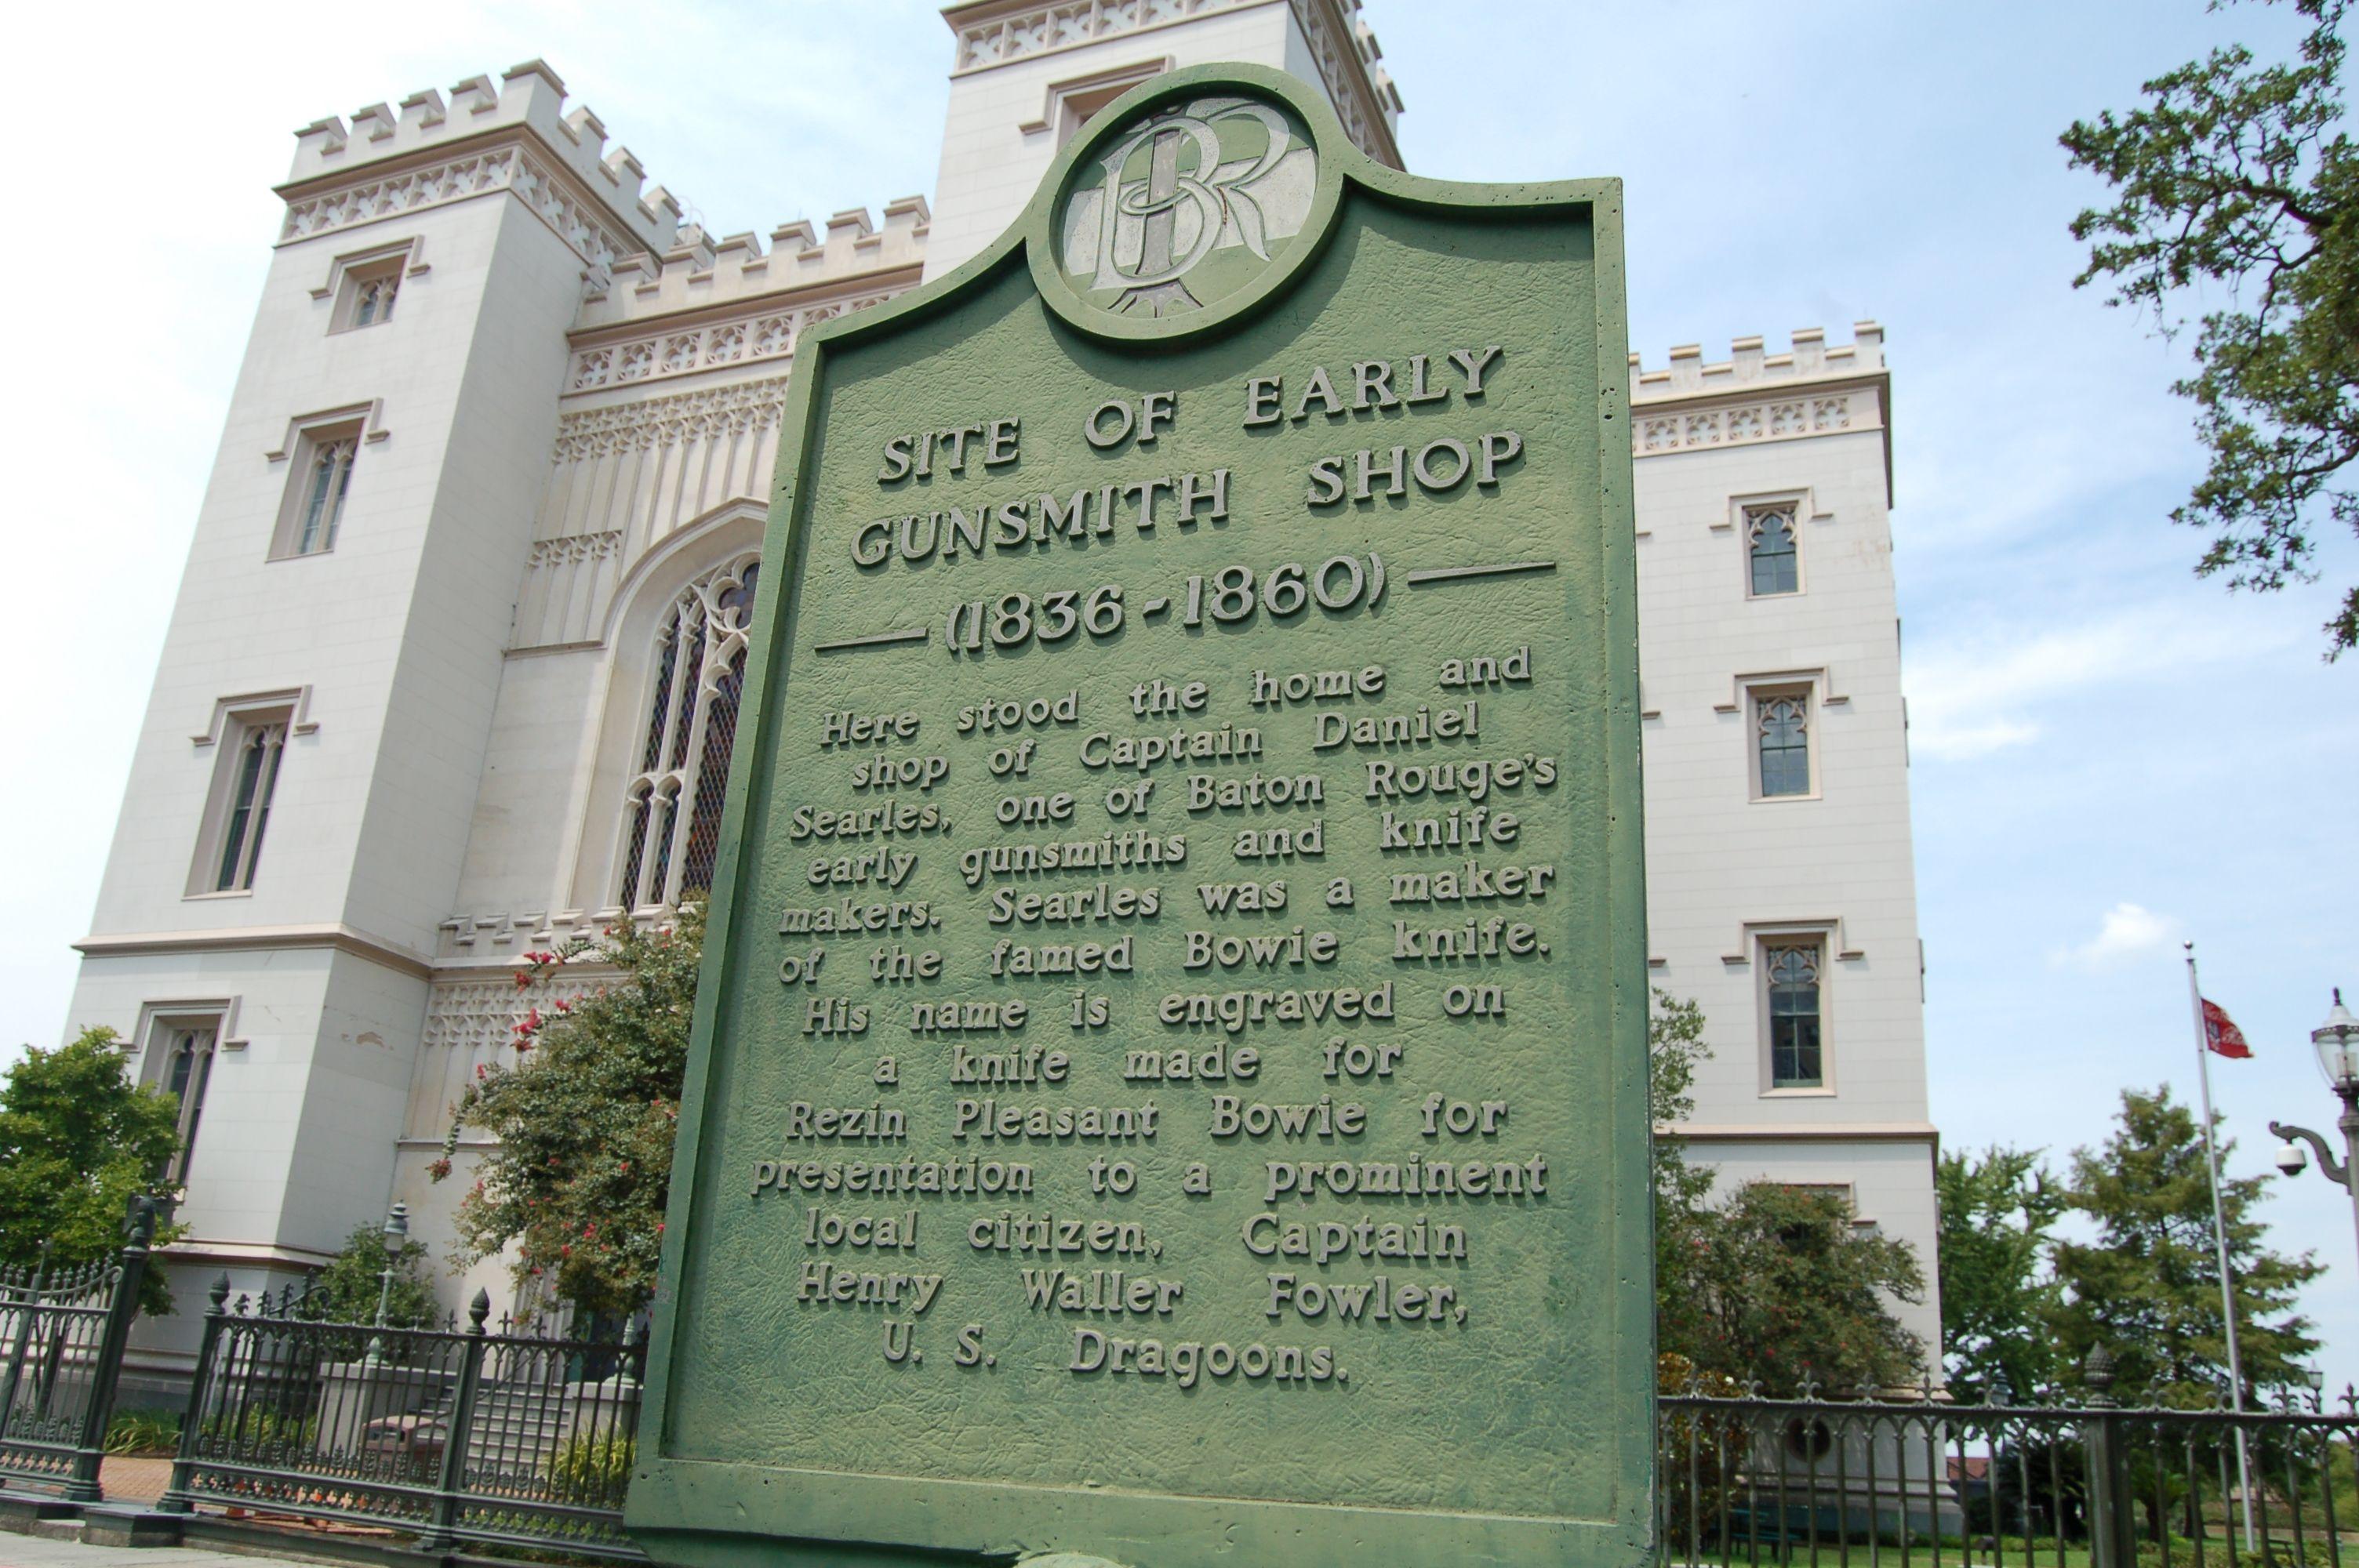 9135e440c30b1557f345684b8c400eb3 - Southern Memorial Gardens Cemetery Baton Rouge